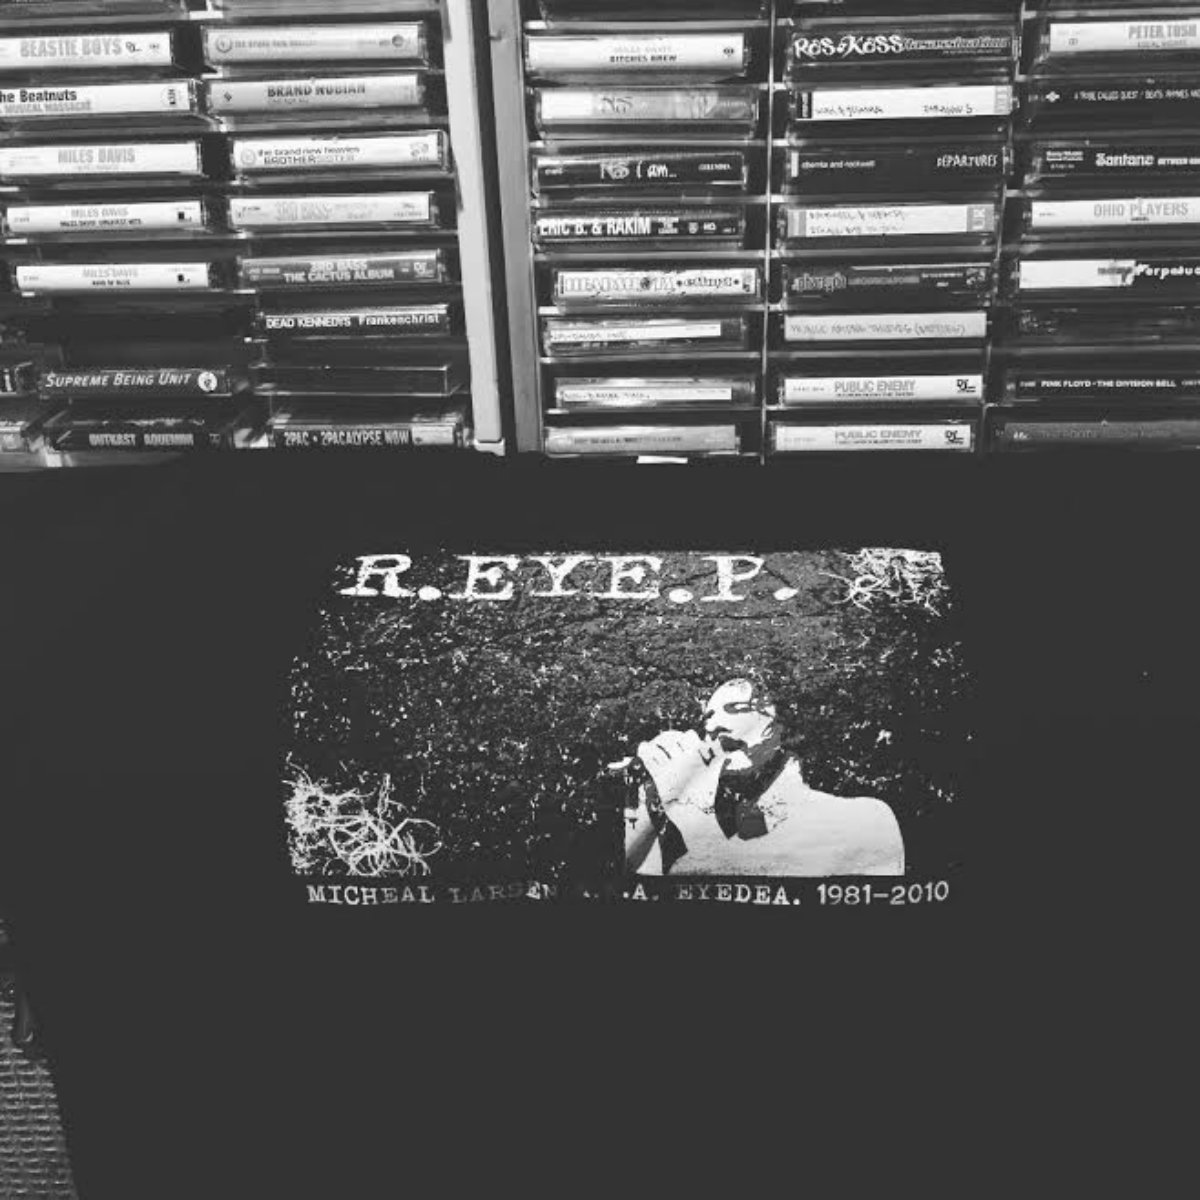 R.Eye.P Crewneck Sweatshirts + Hoodies Now Available!